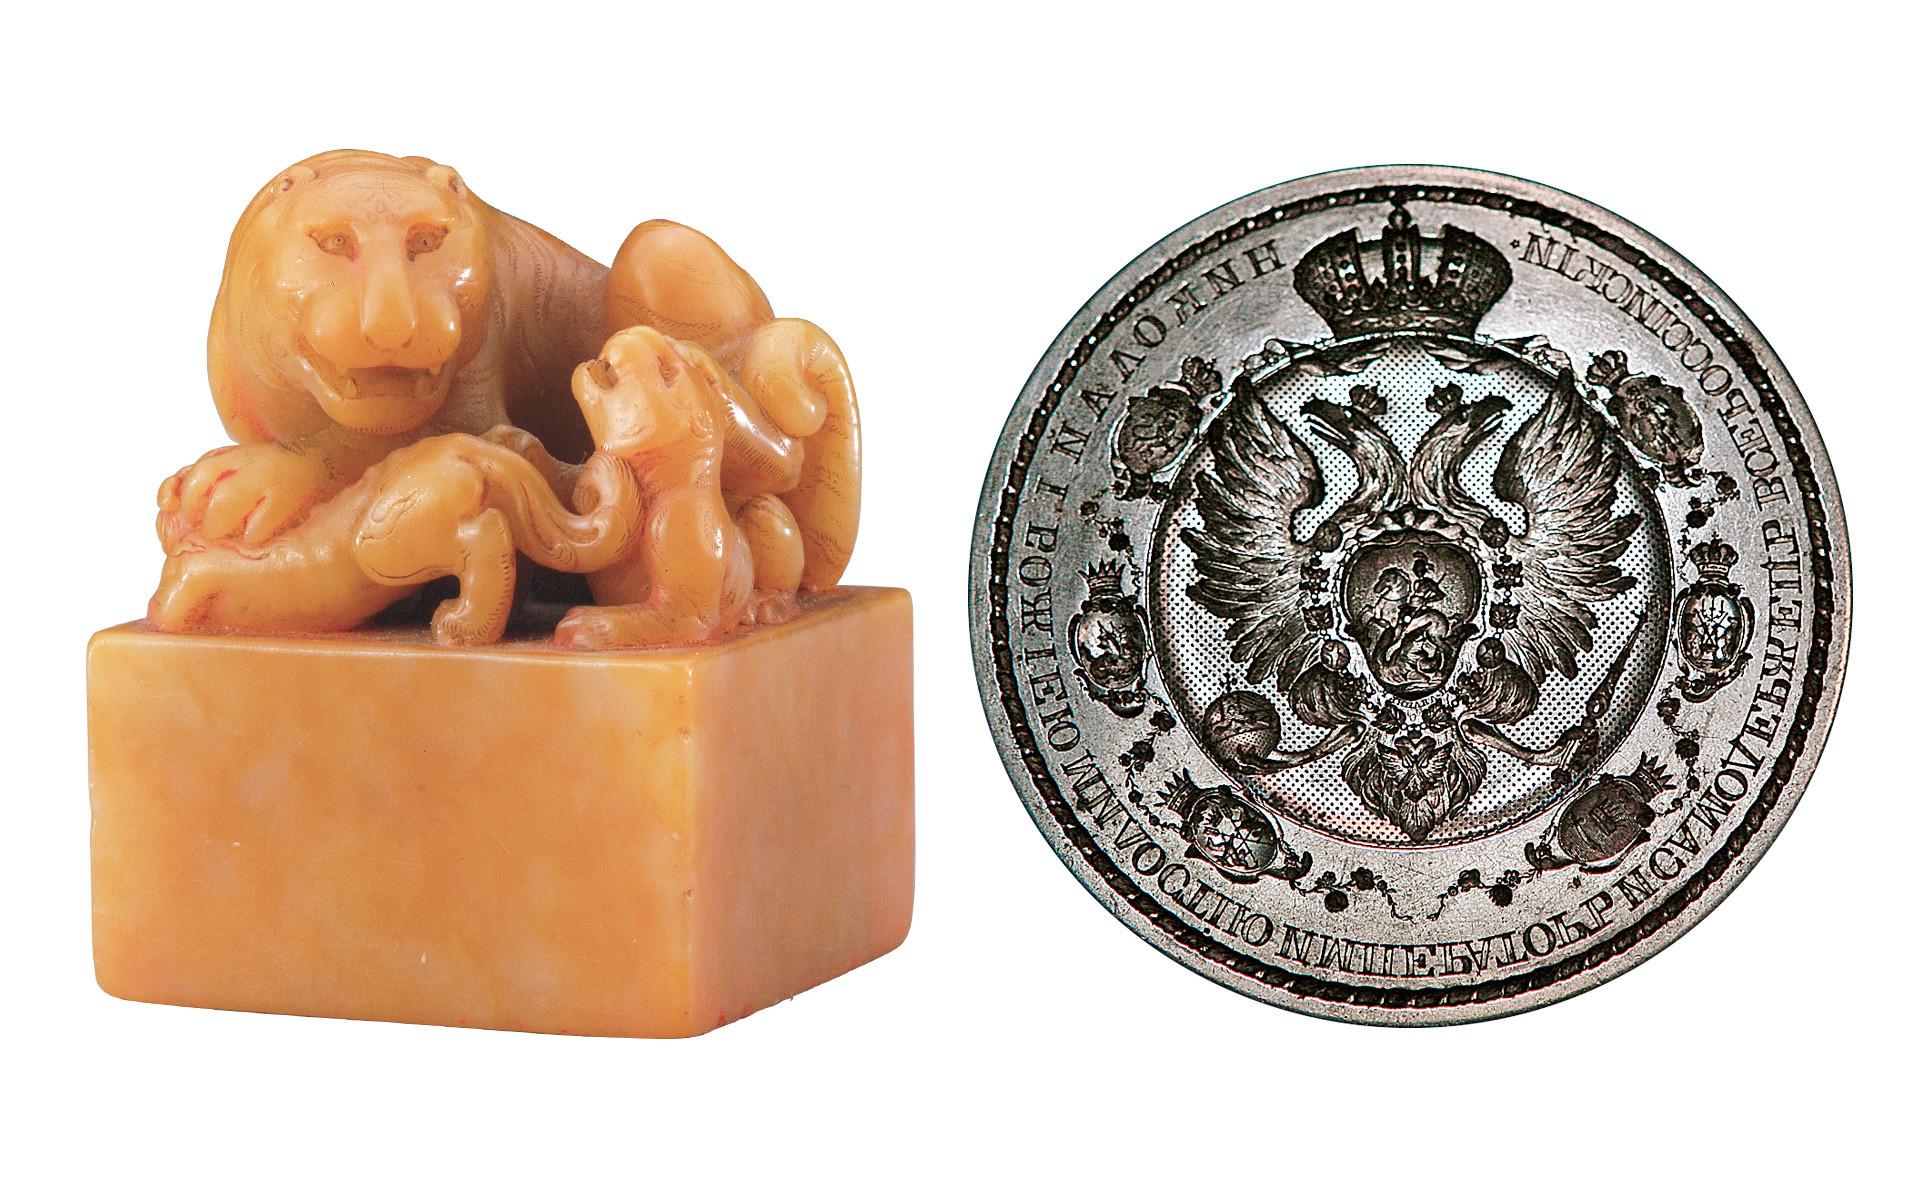 Слева: Императорская печать «Императорская кисть Цяньлуна». Эпоха Цин, правление Цяньлун (1736–1796). Справа: Государственная малая печать императора Николая I